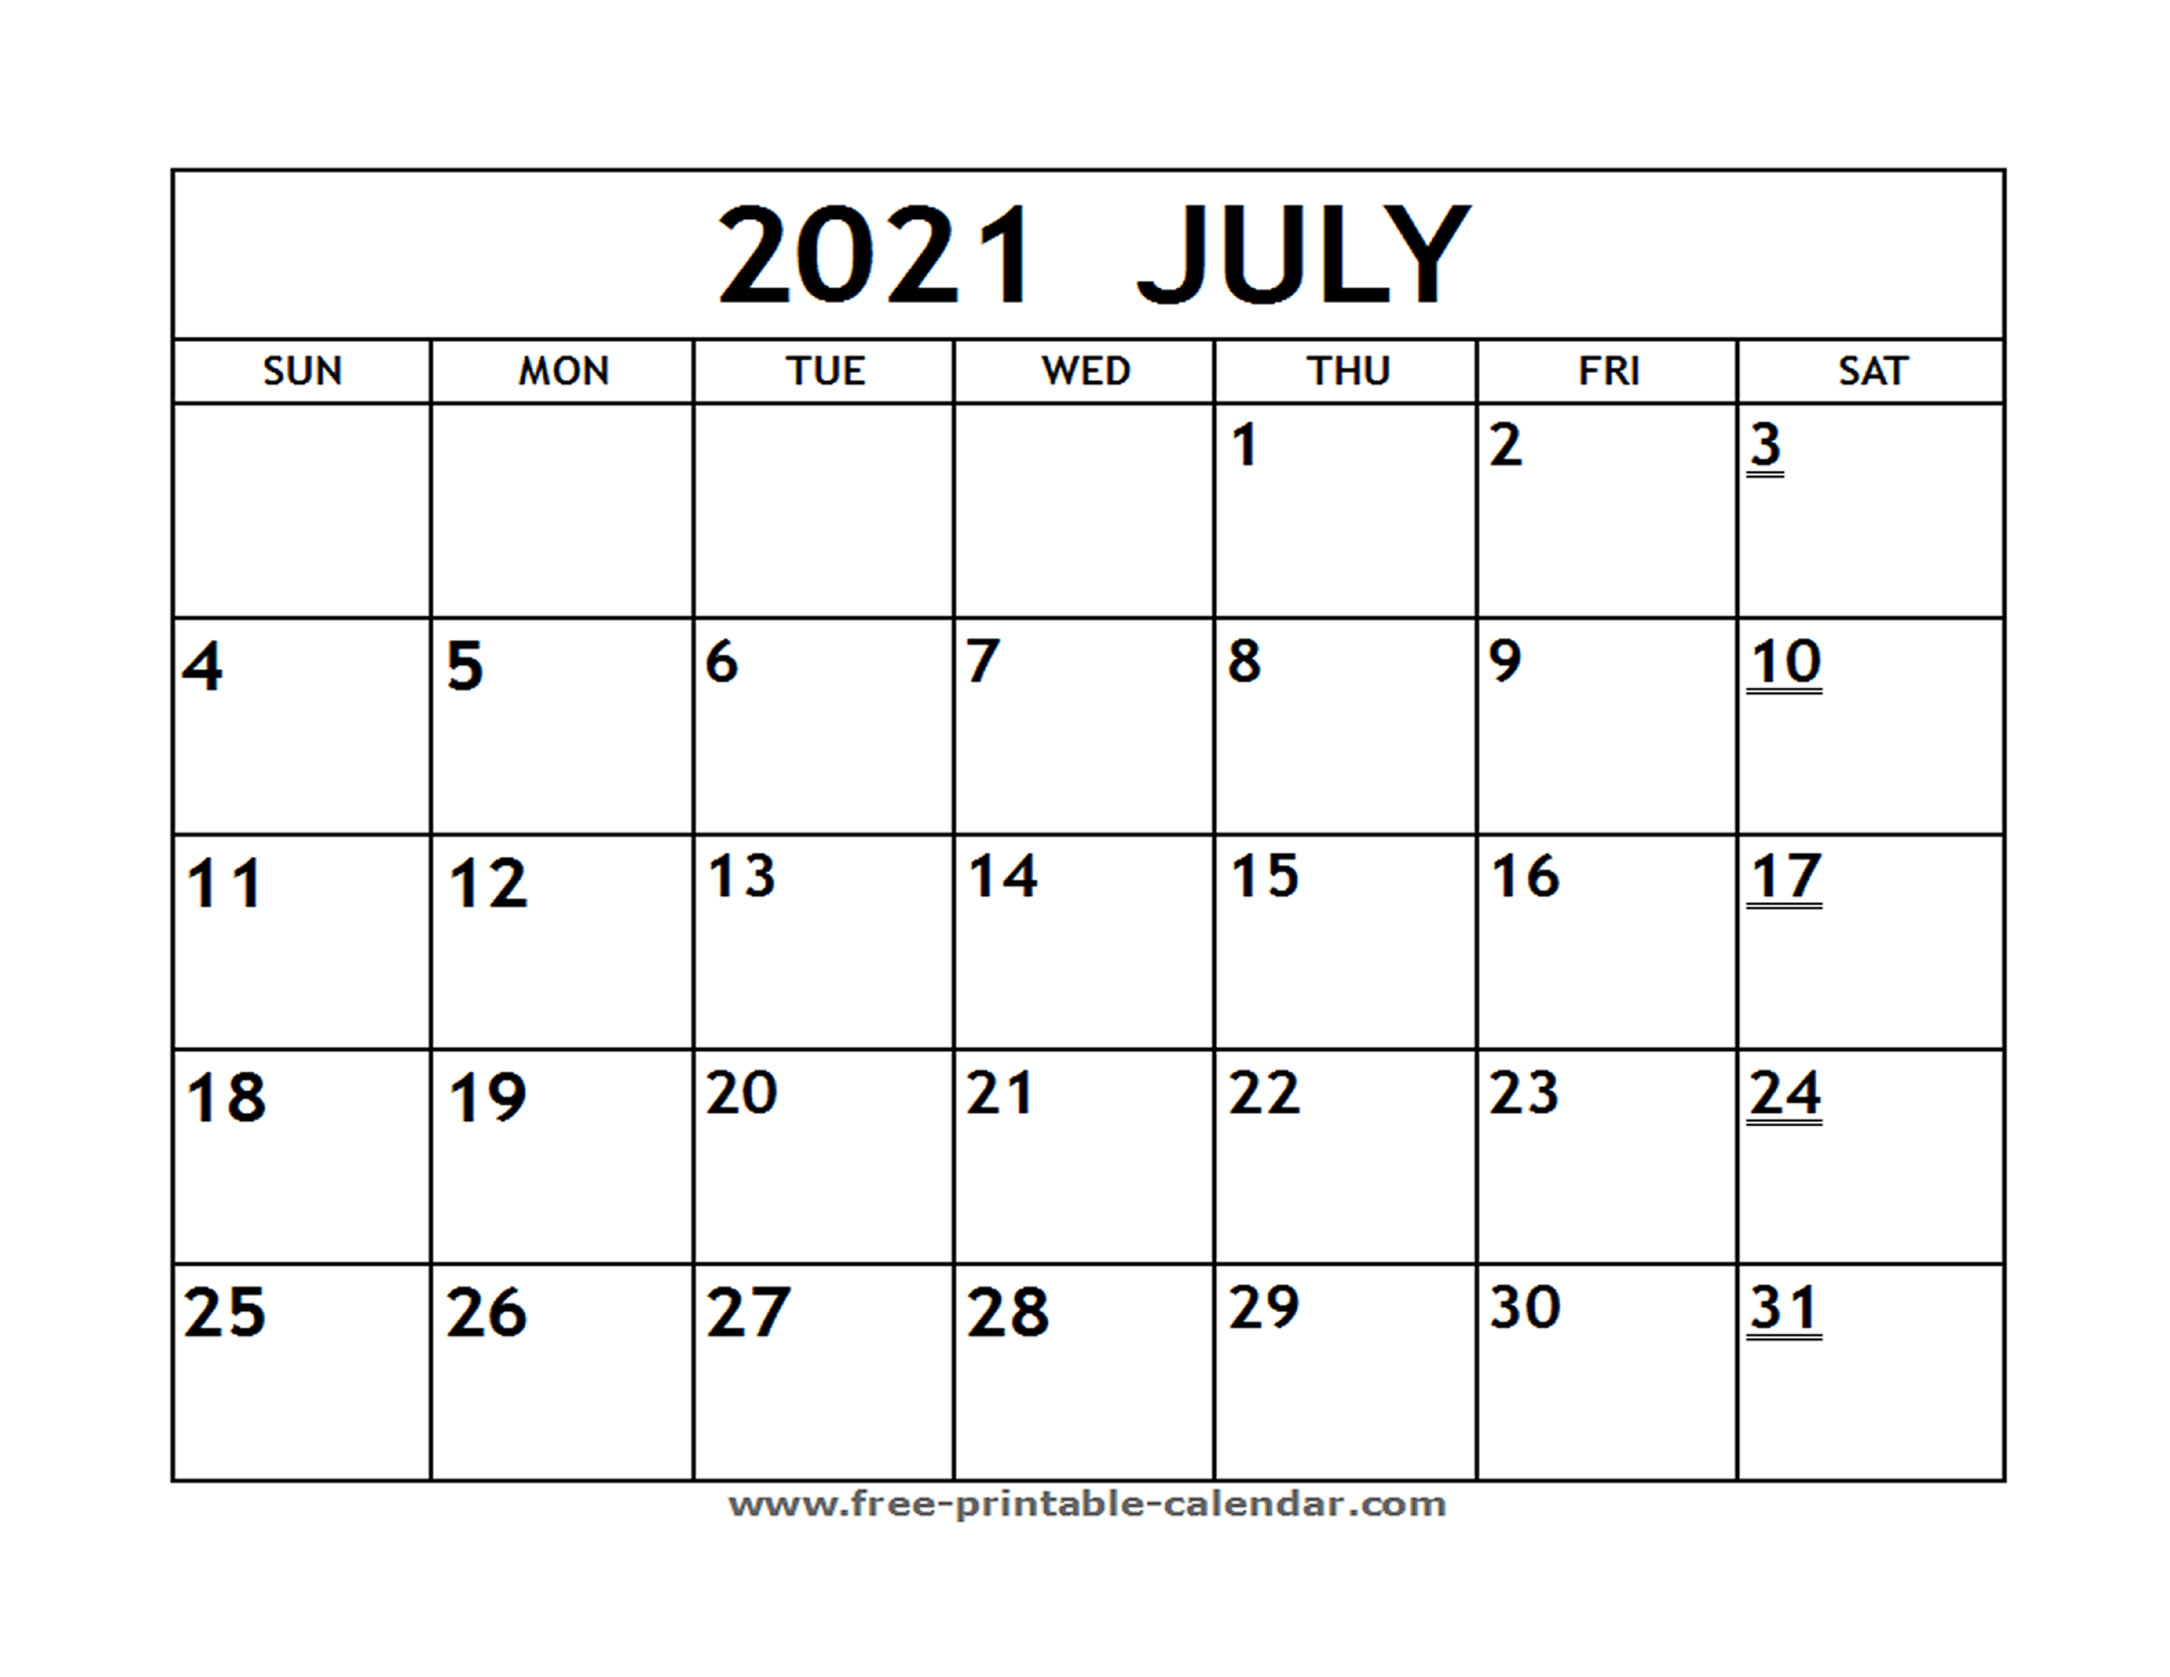 Printable 2021 July Calendar  Freeprintablecalendar throughout Blank Monthly Calendar 2021